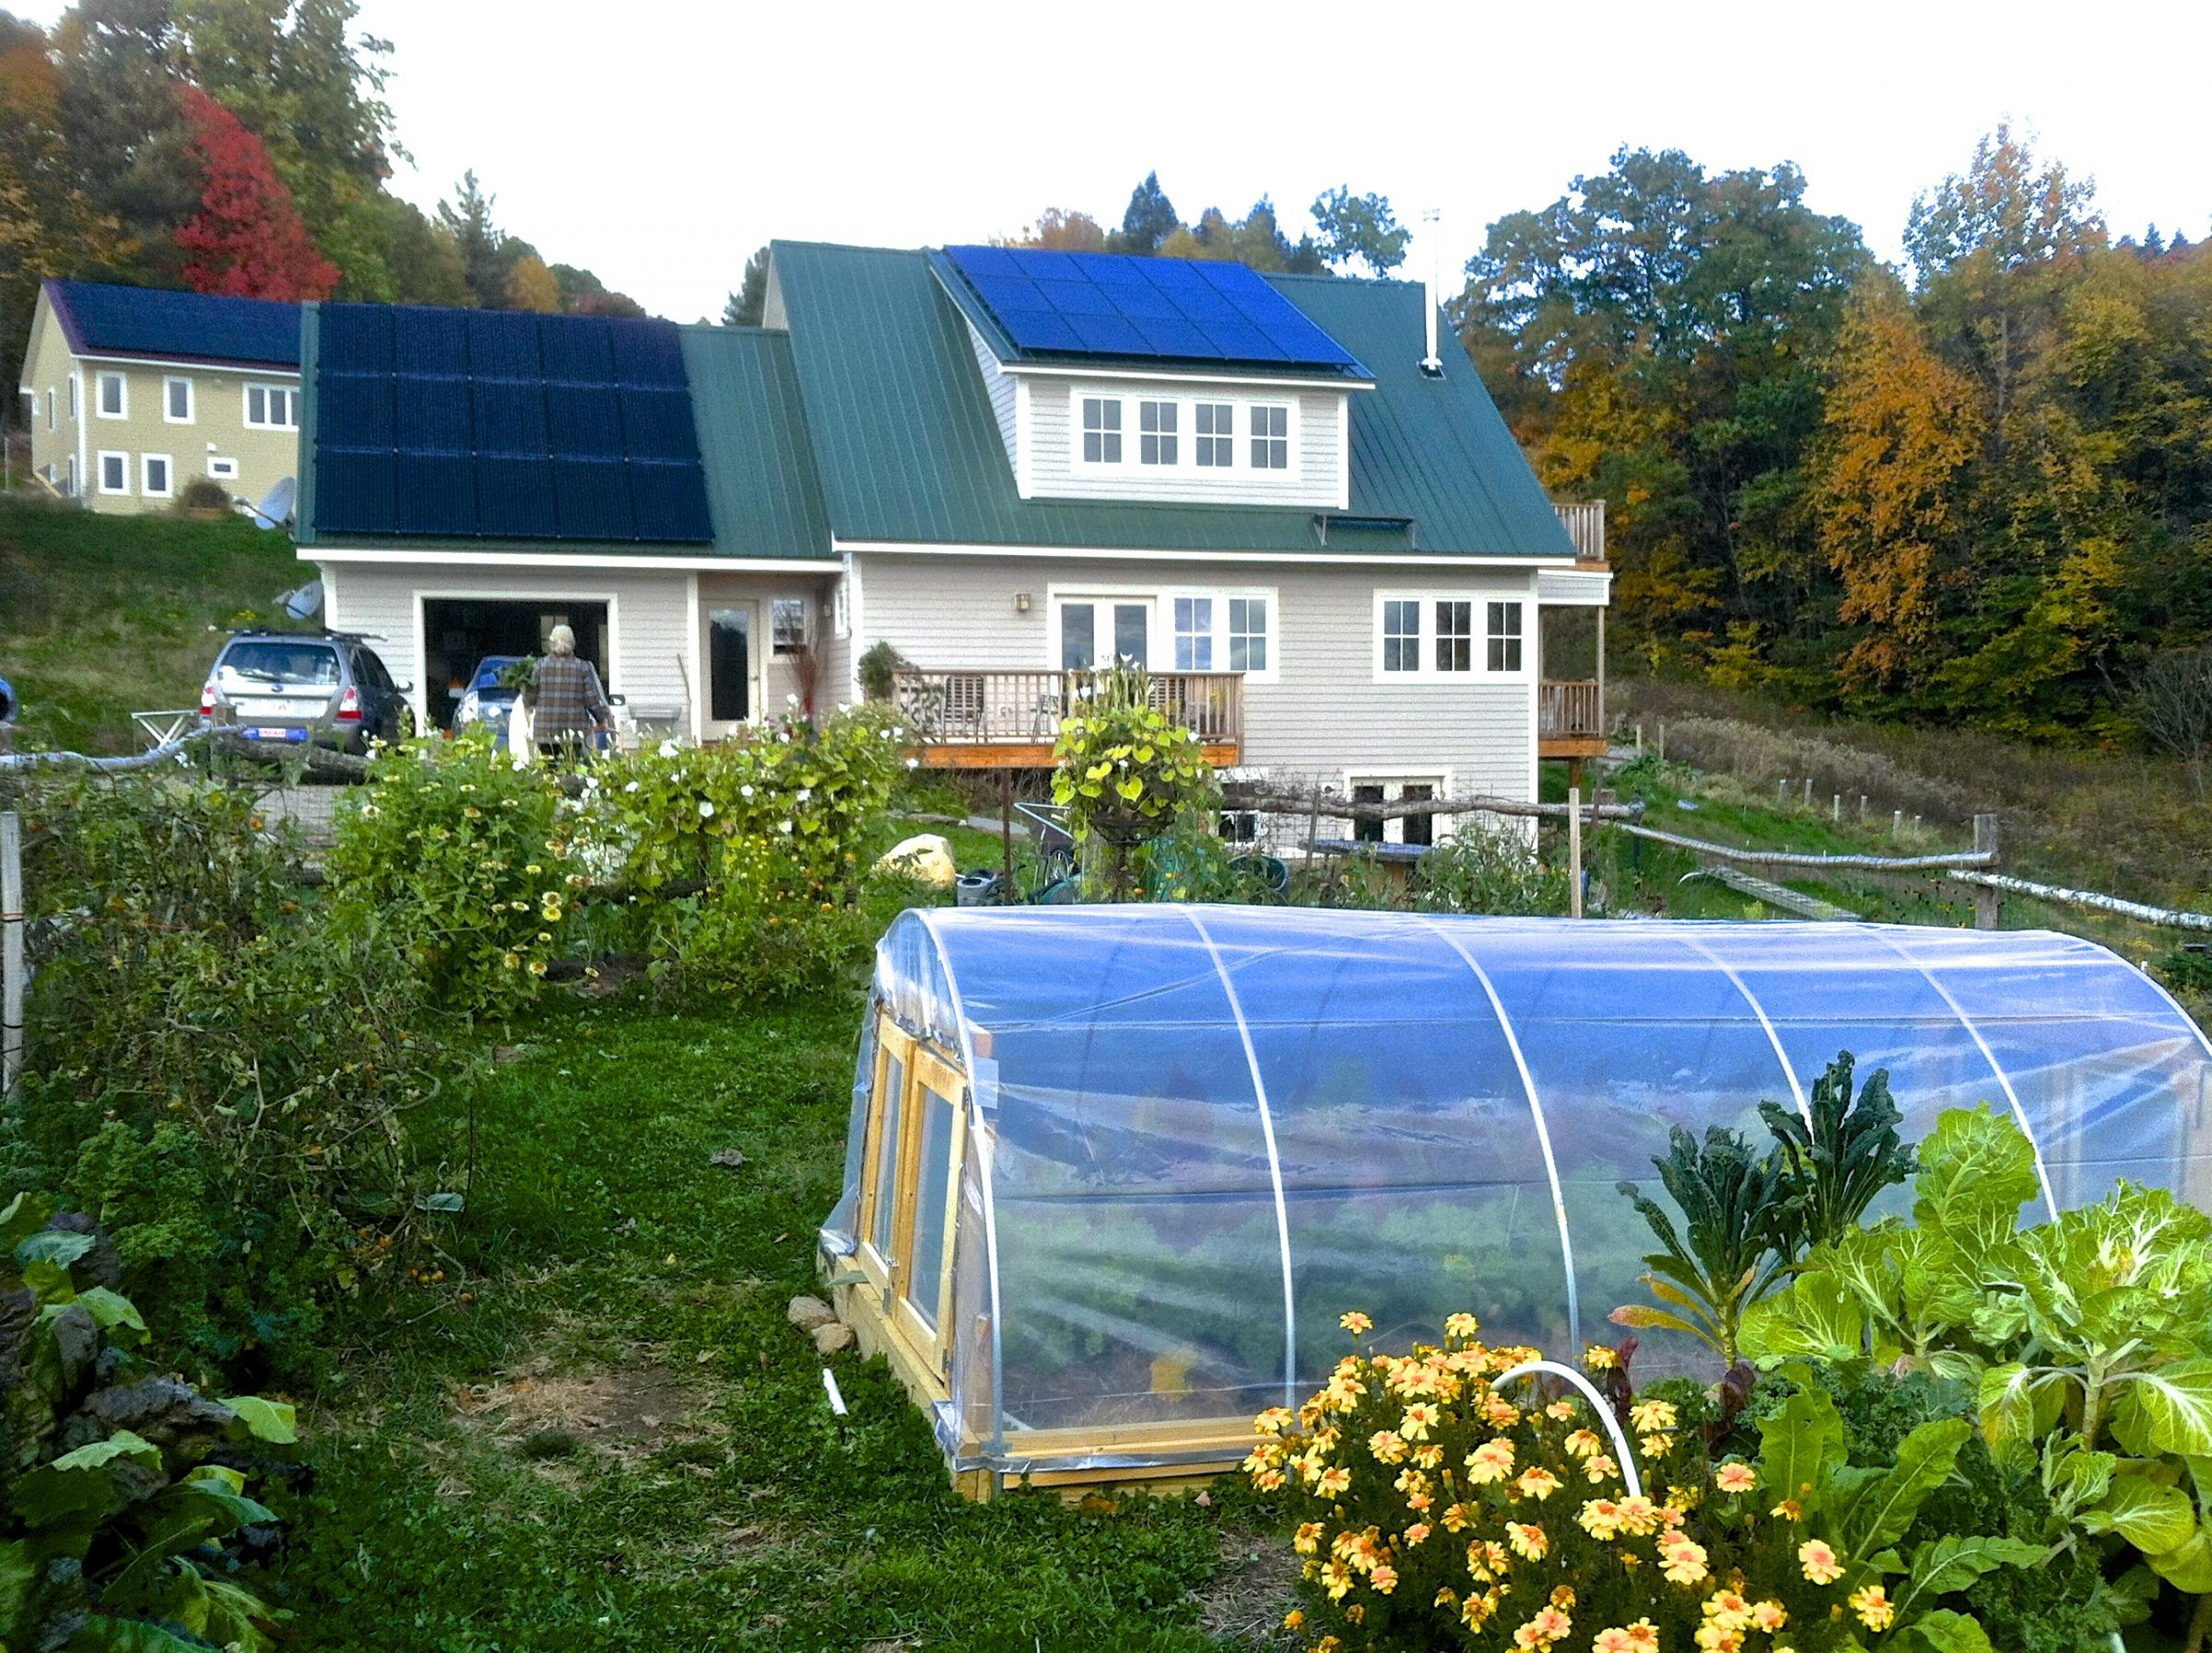 Net Zero Energy home Katywil Community Colrain MA